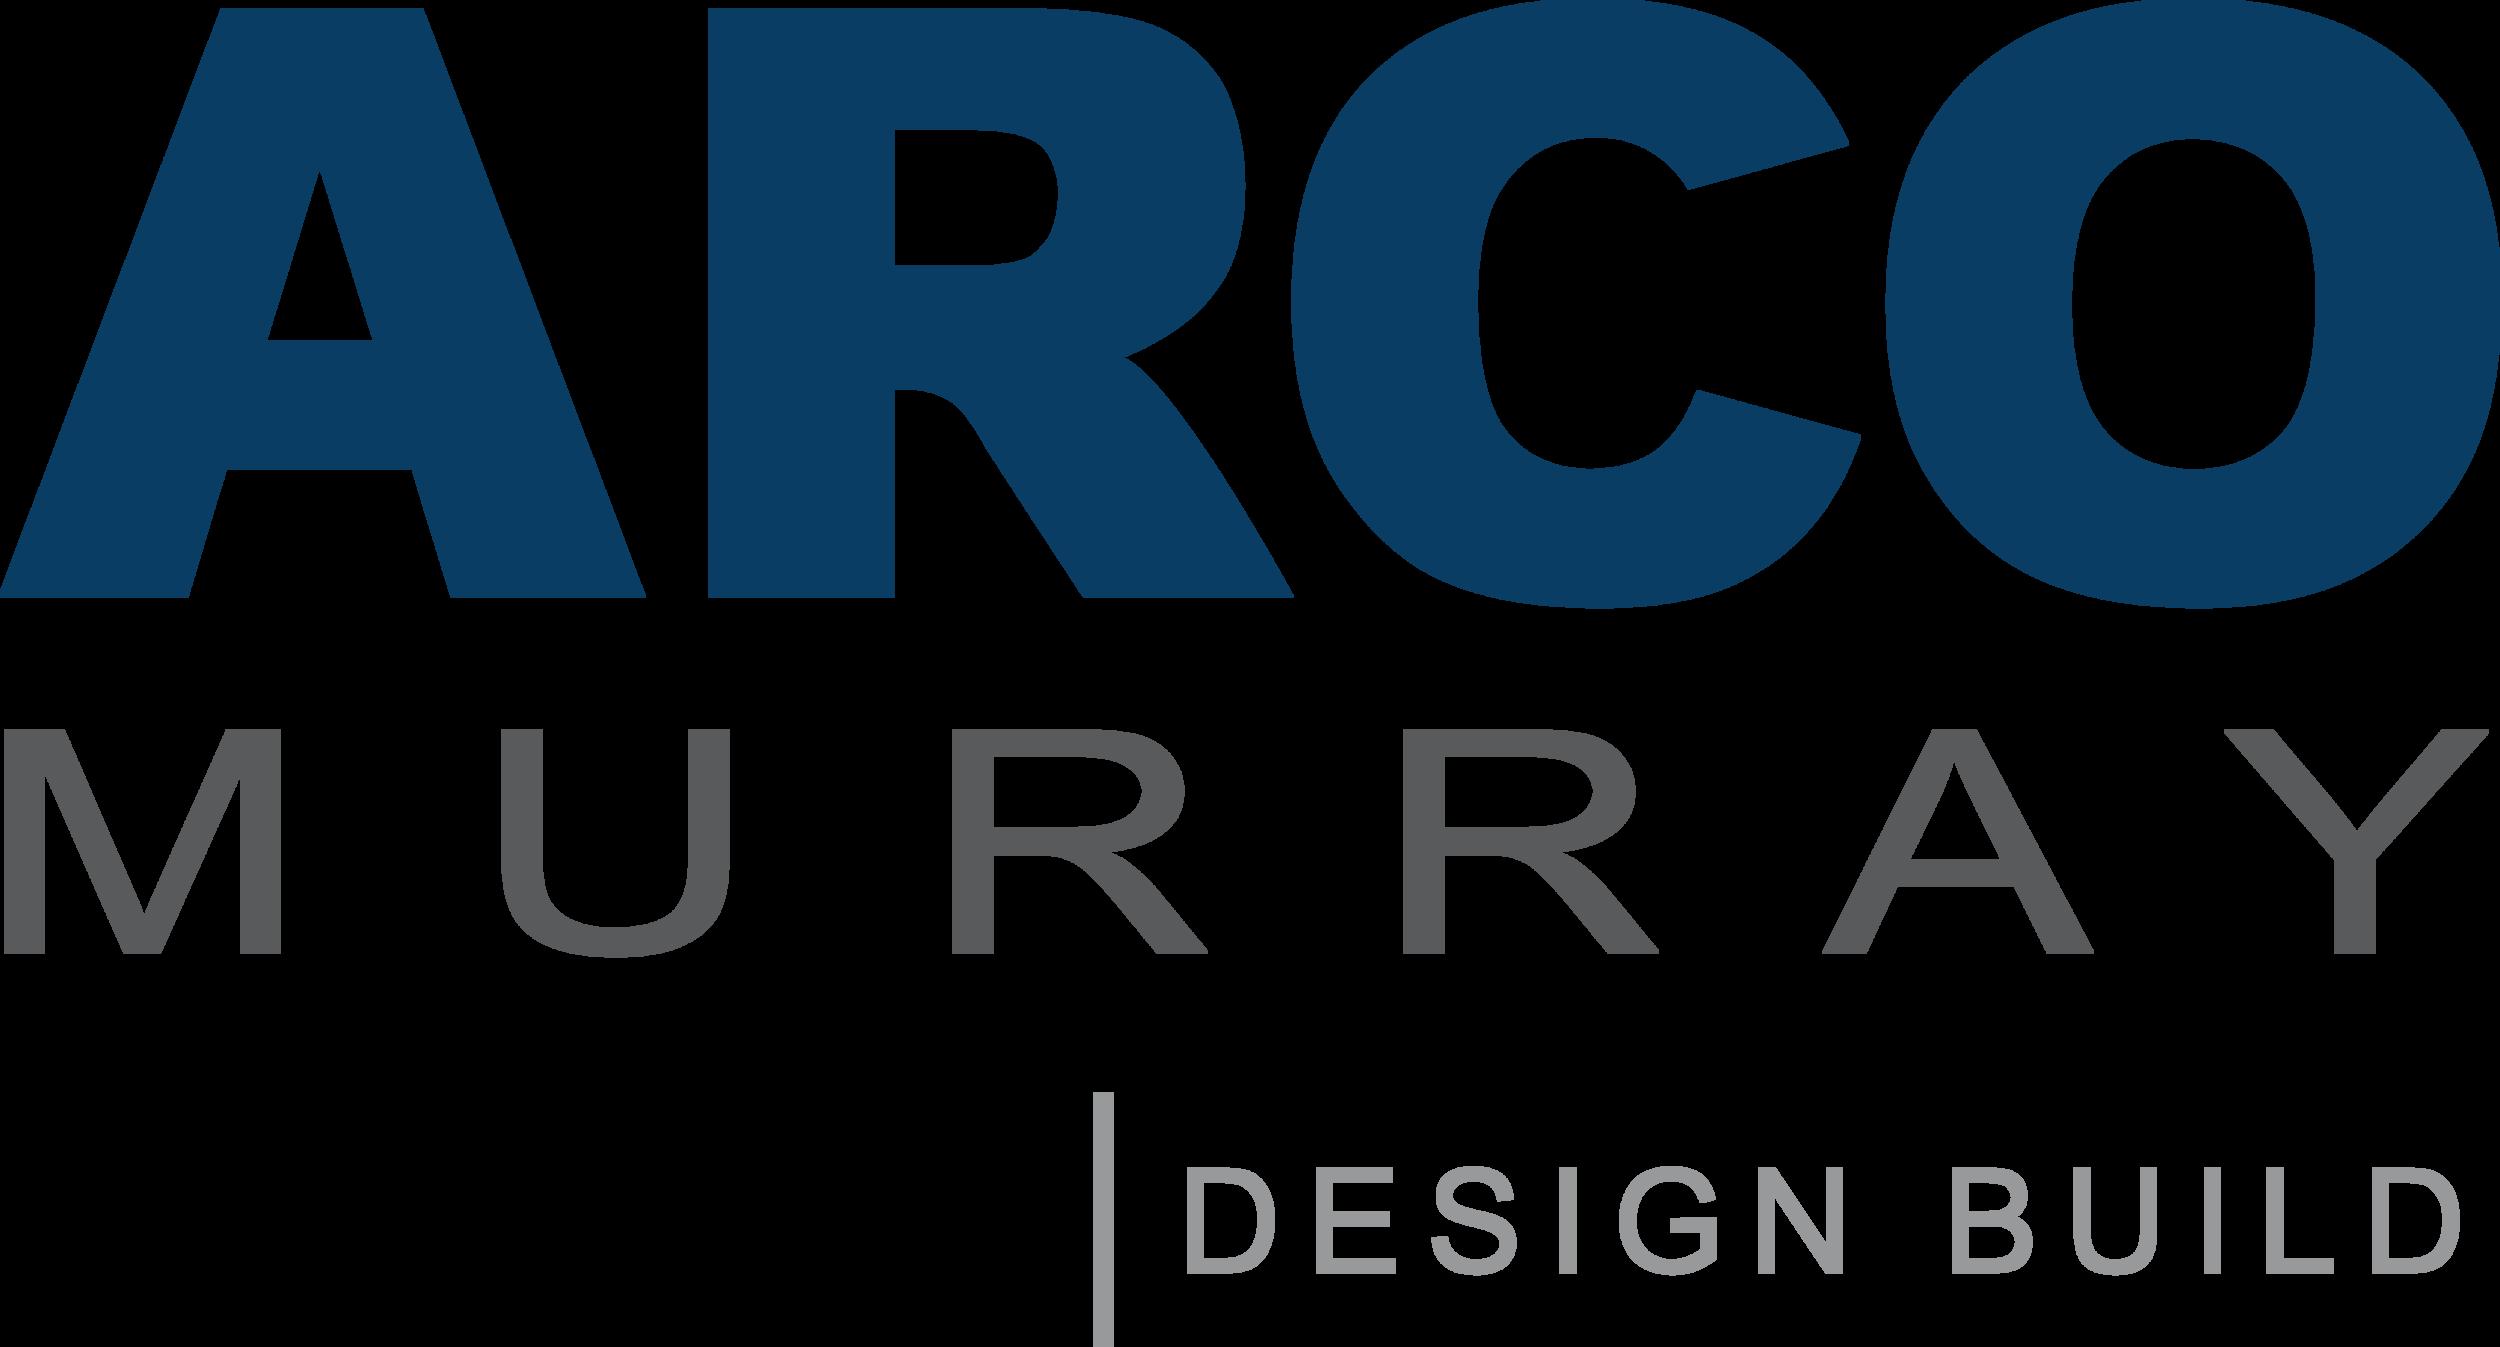 ARCO Murray Design Build - transparent.png